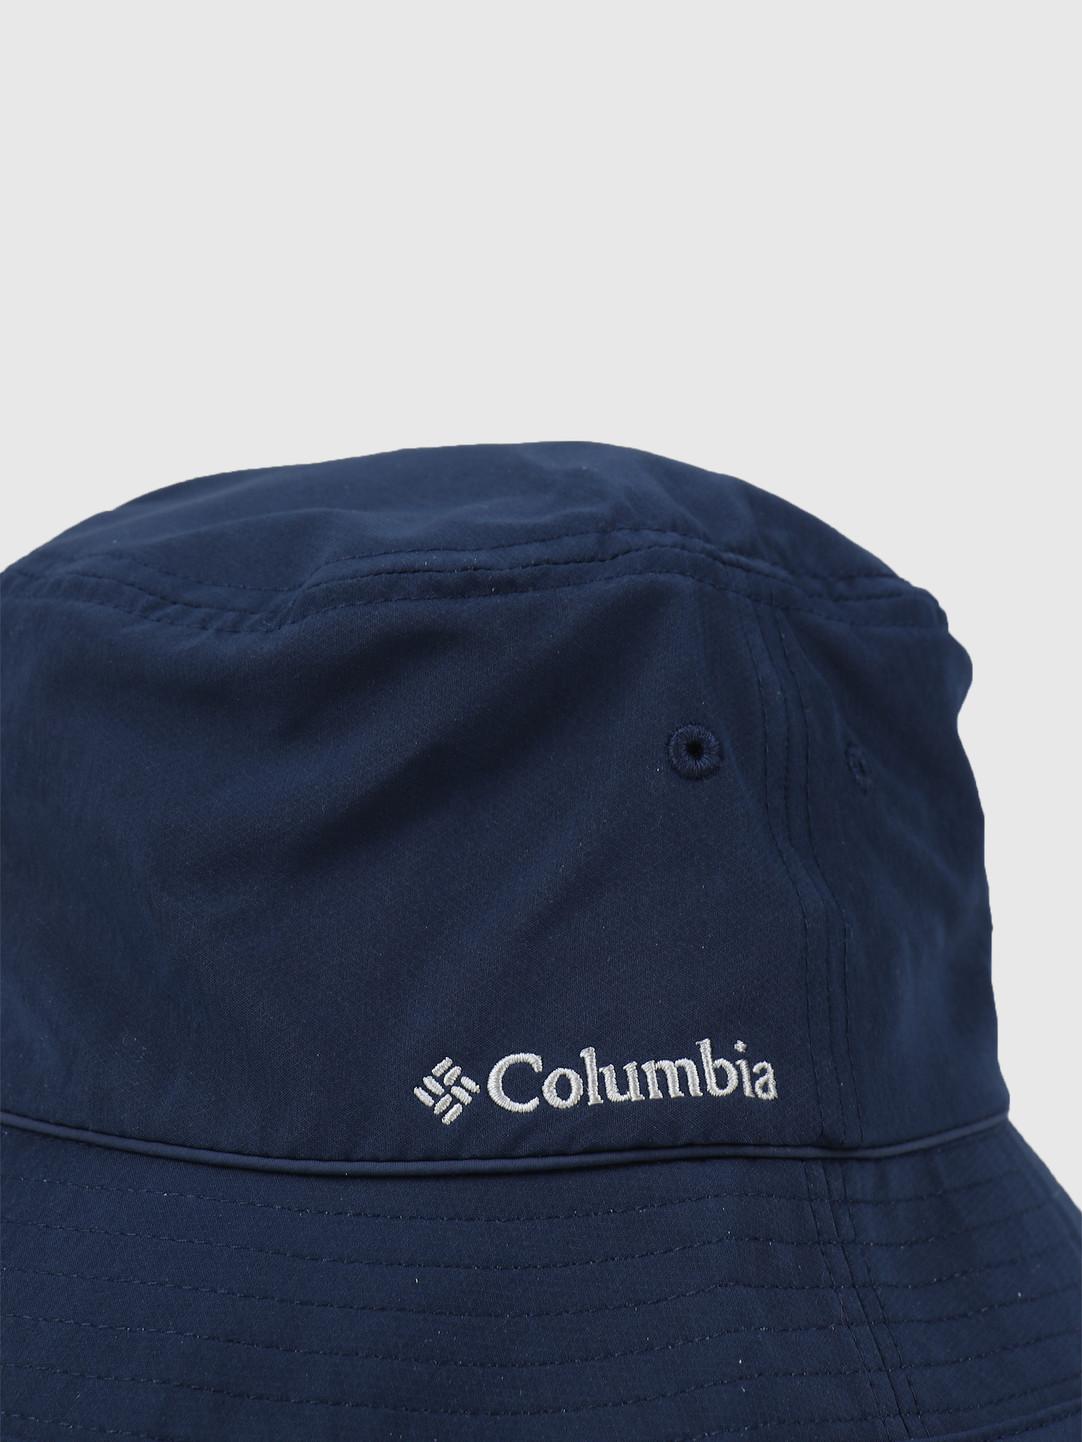 Columbia Columbia Pine Mountain Bucket Hat Collegiate Navy 1714881469